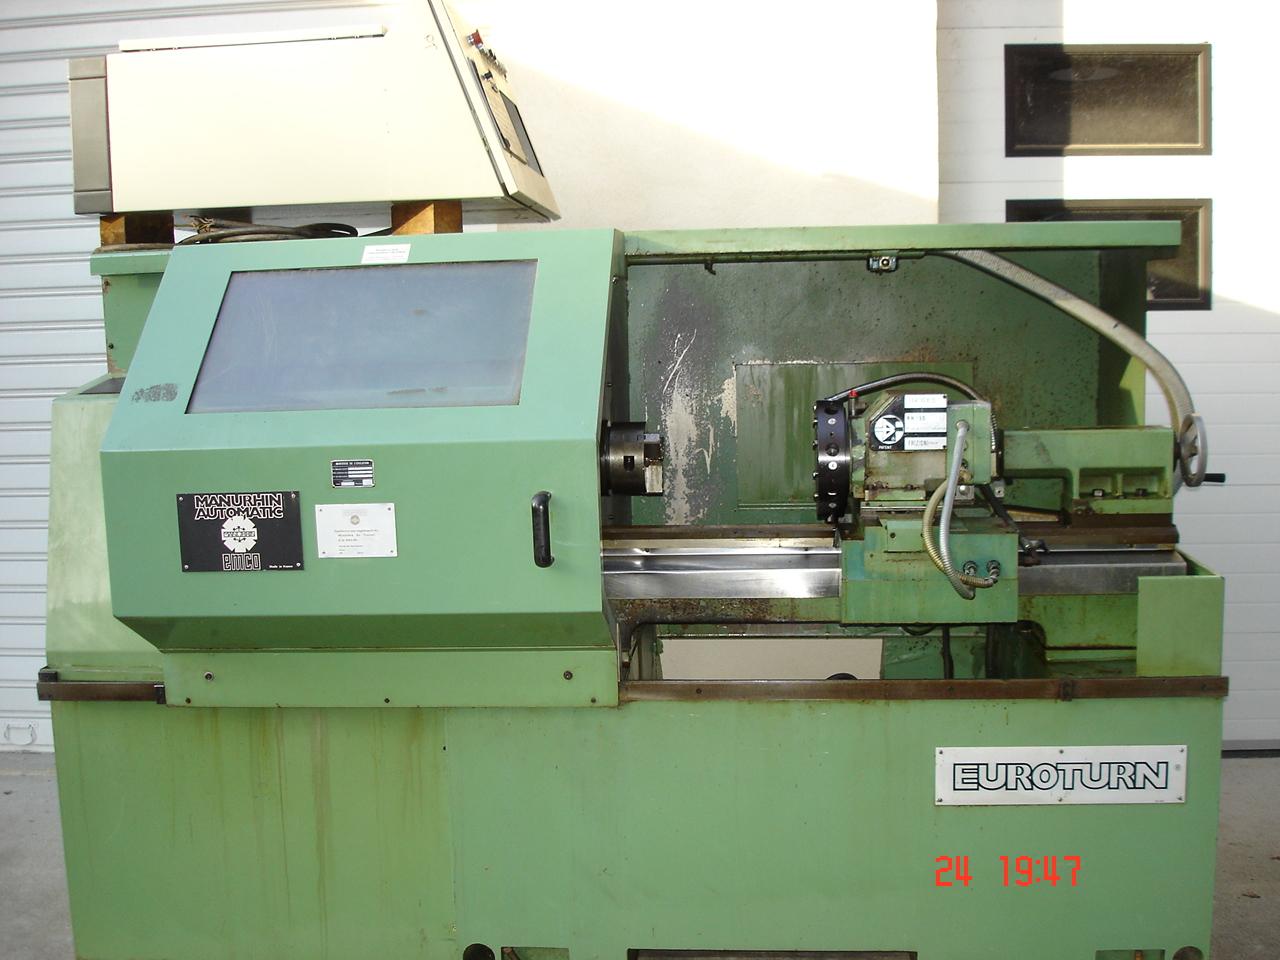 euroturn machine